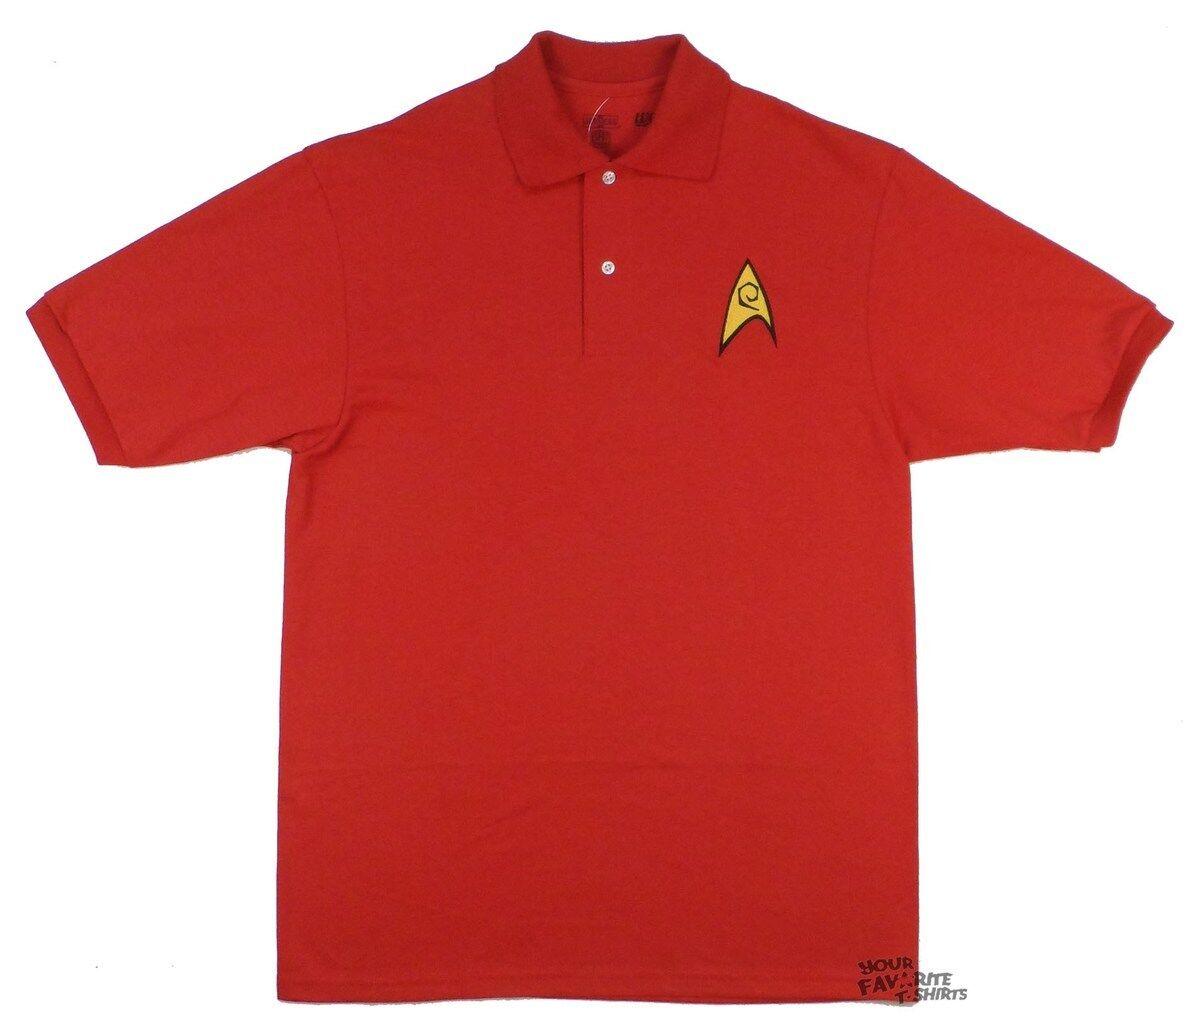 Star trek starfleet security symbol licensed adult embroidered picture 1 of 1 buycottarizona